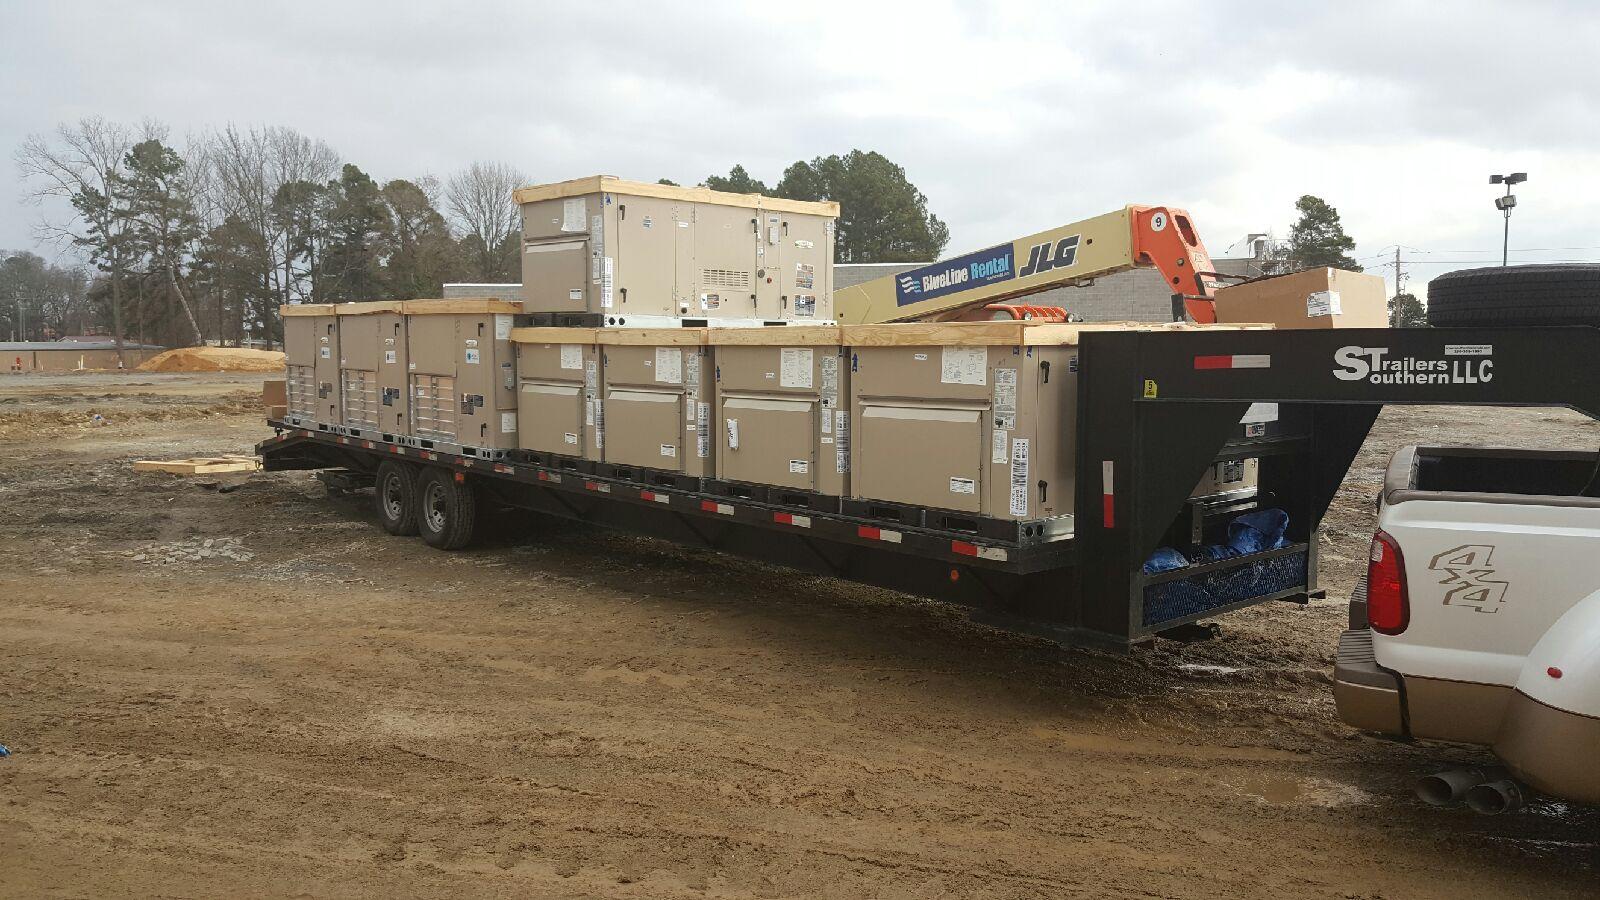 lawrence trucking llc image 2